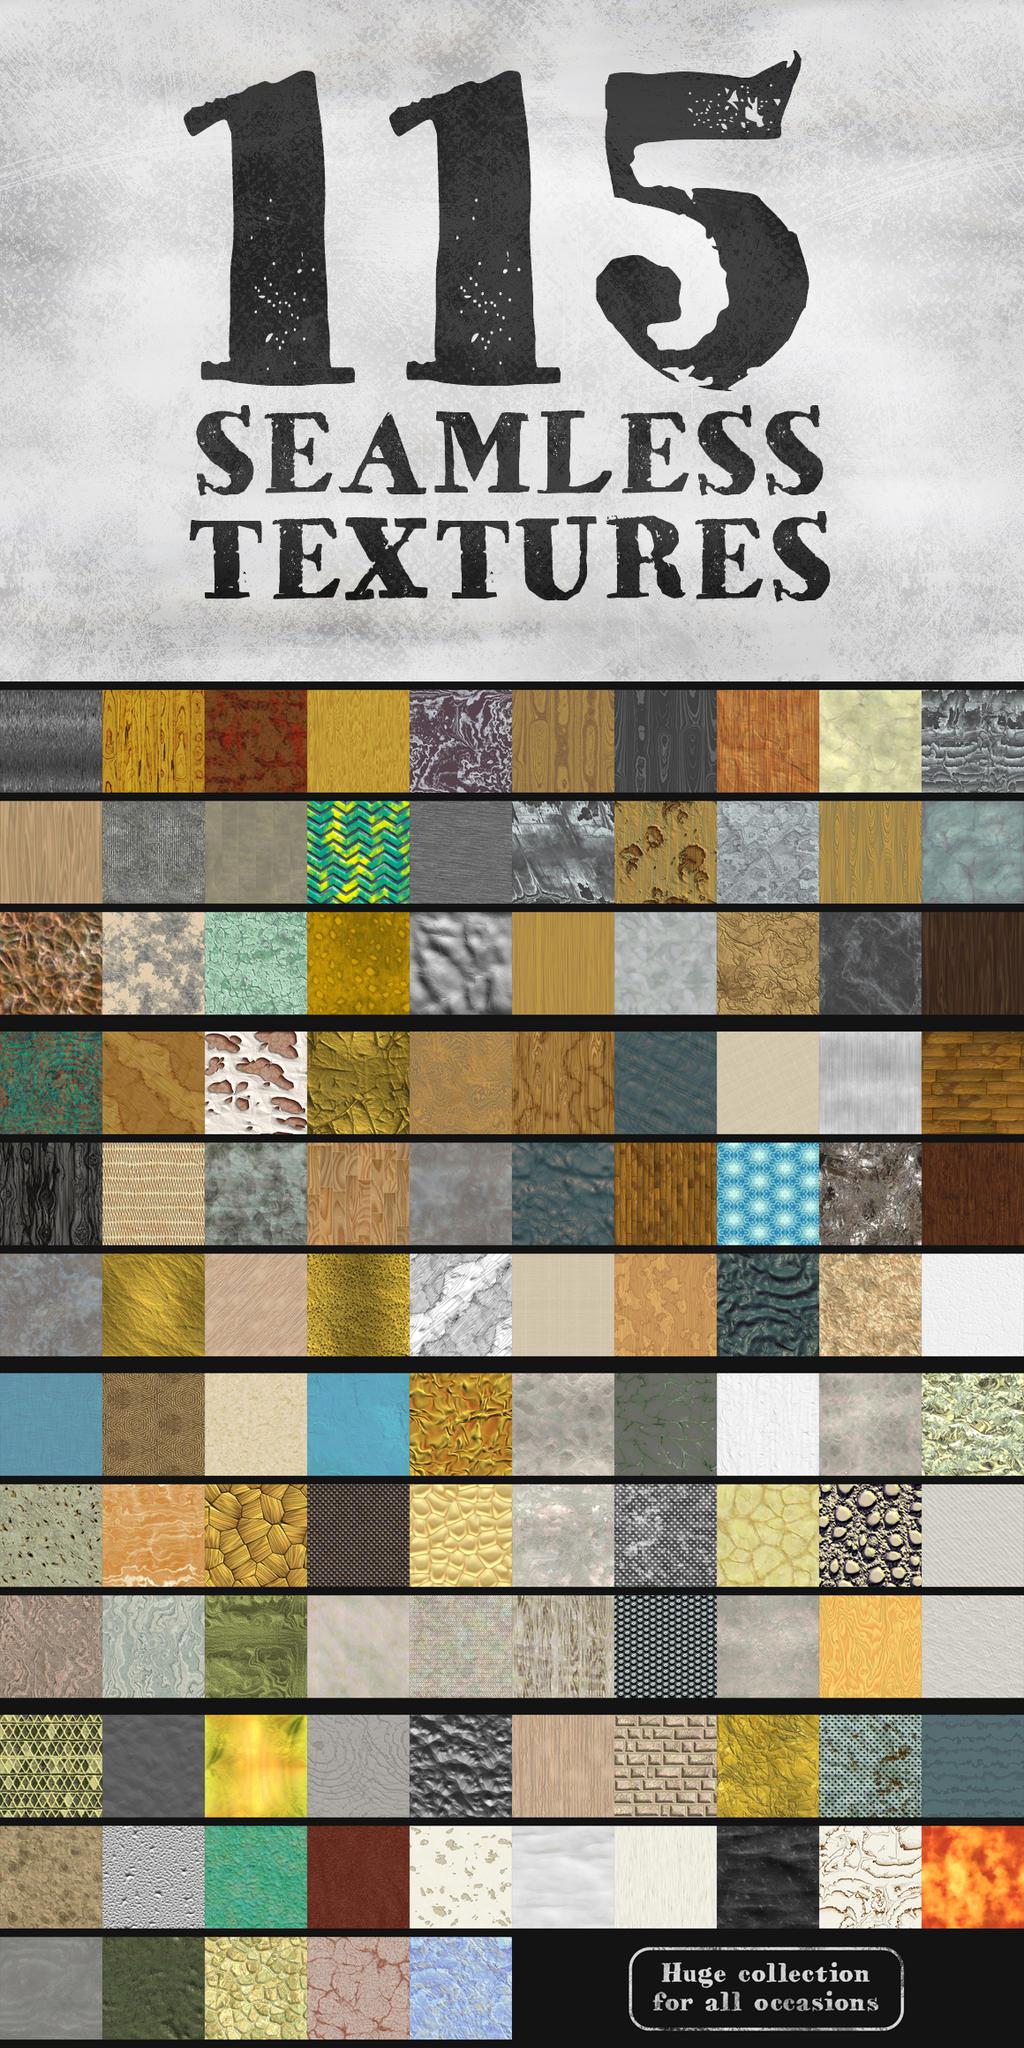 115 seamless textures by artgusart